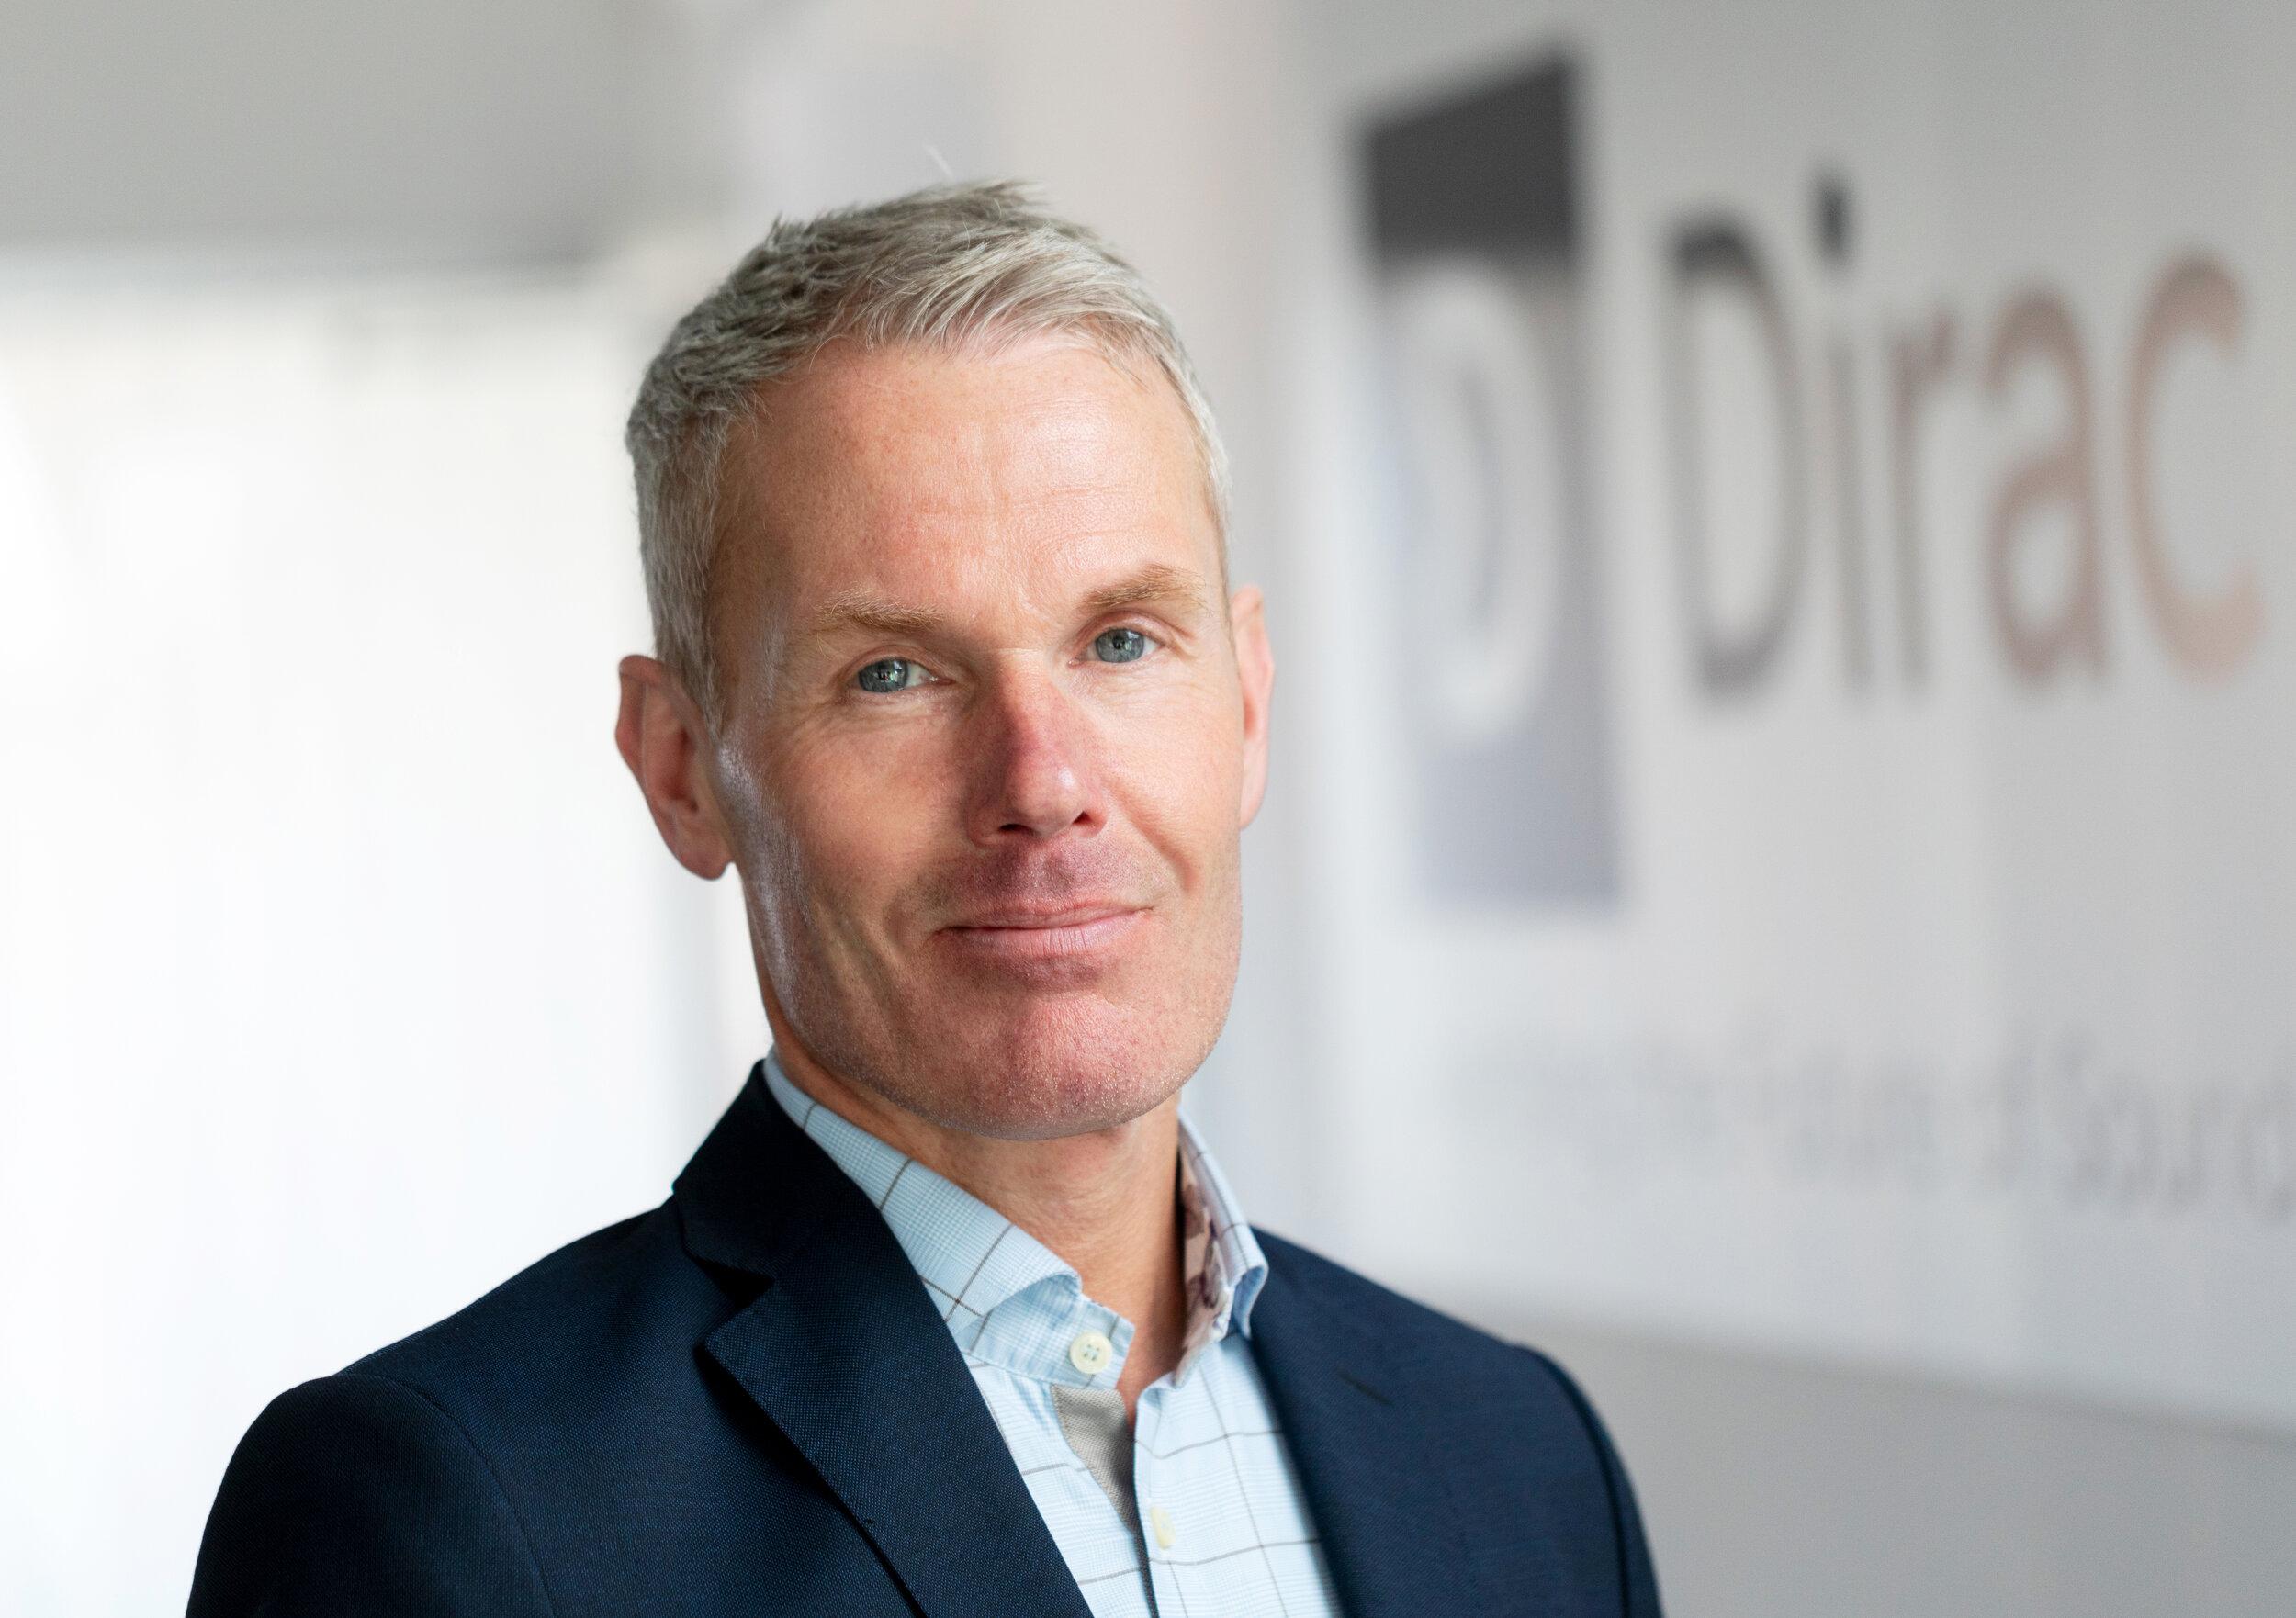 Lars Isaksson, GM of Headphone Audio - Dirac